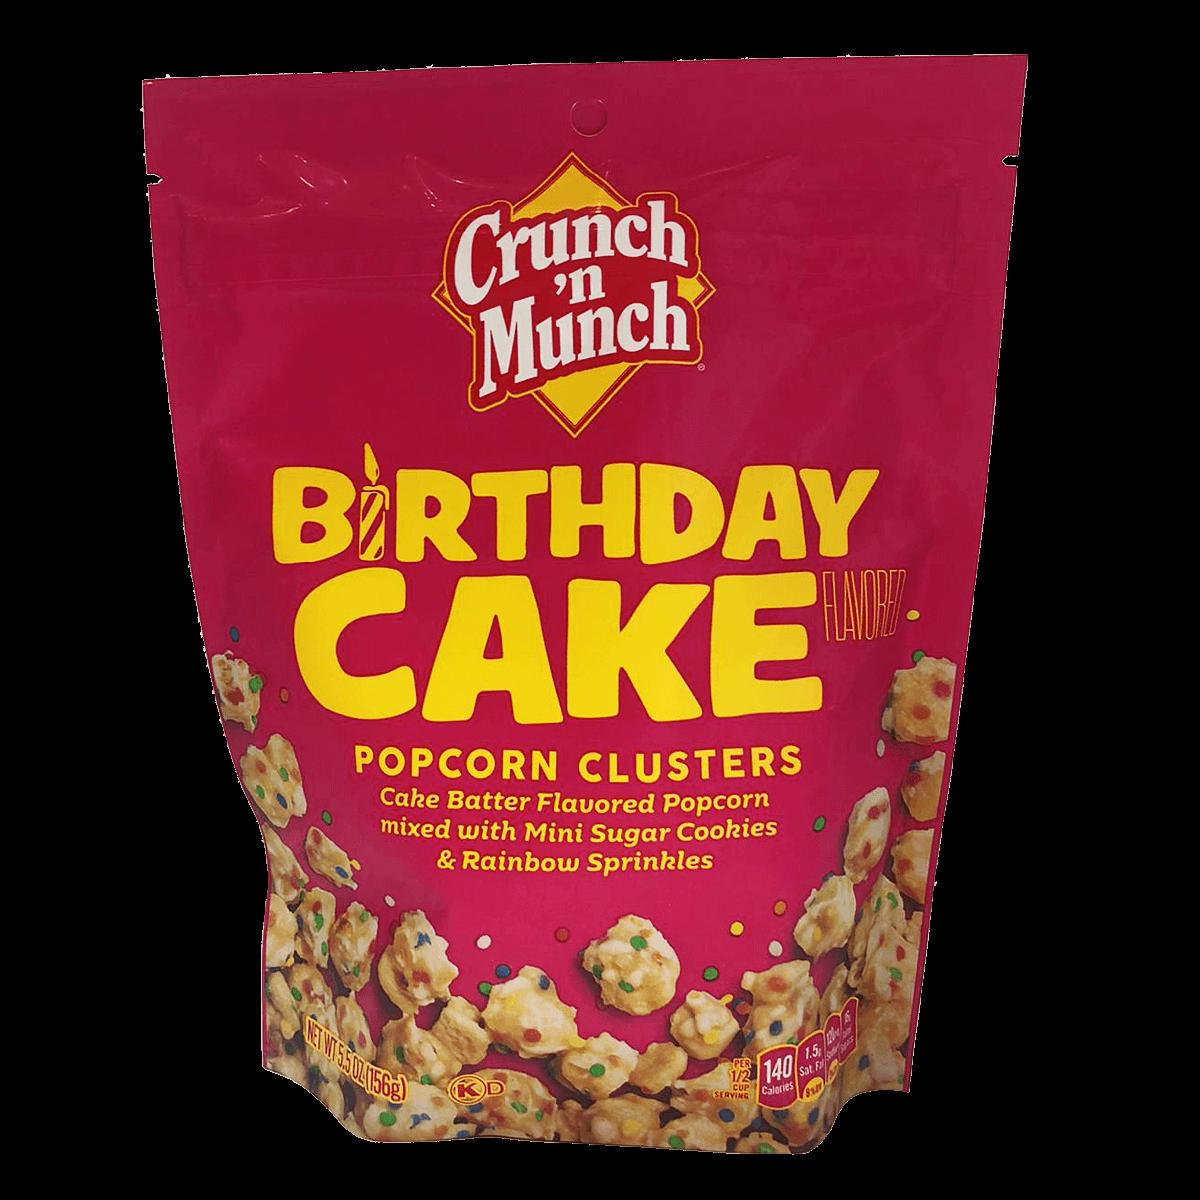 Crunch´n Munch Birthday Cake Popcorn Clusters 156 g